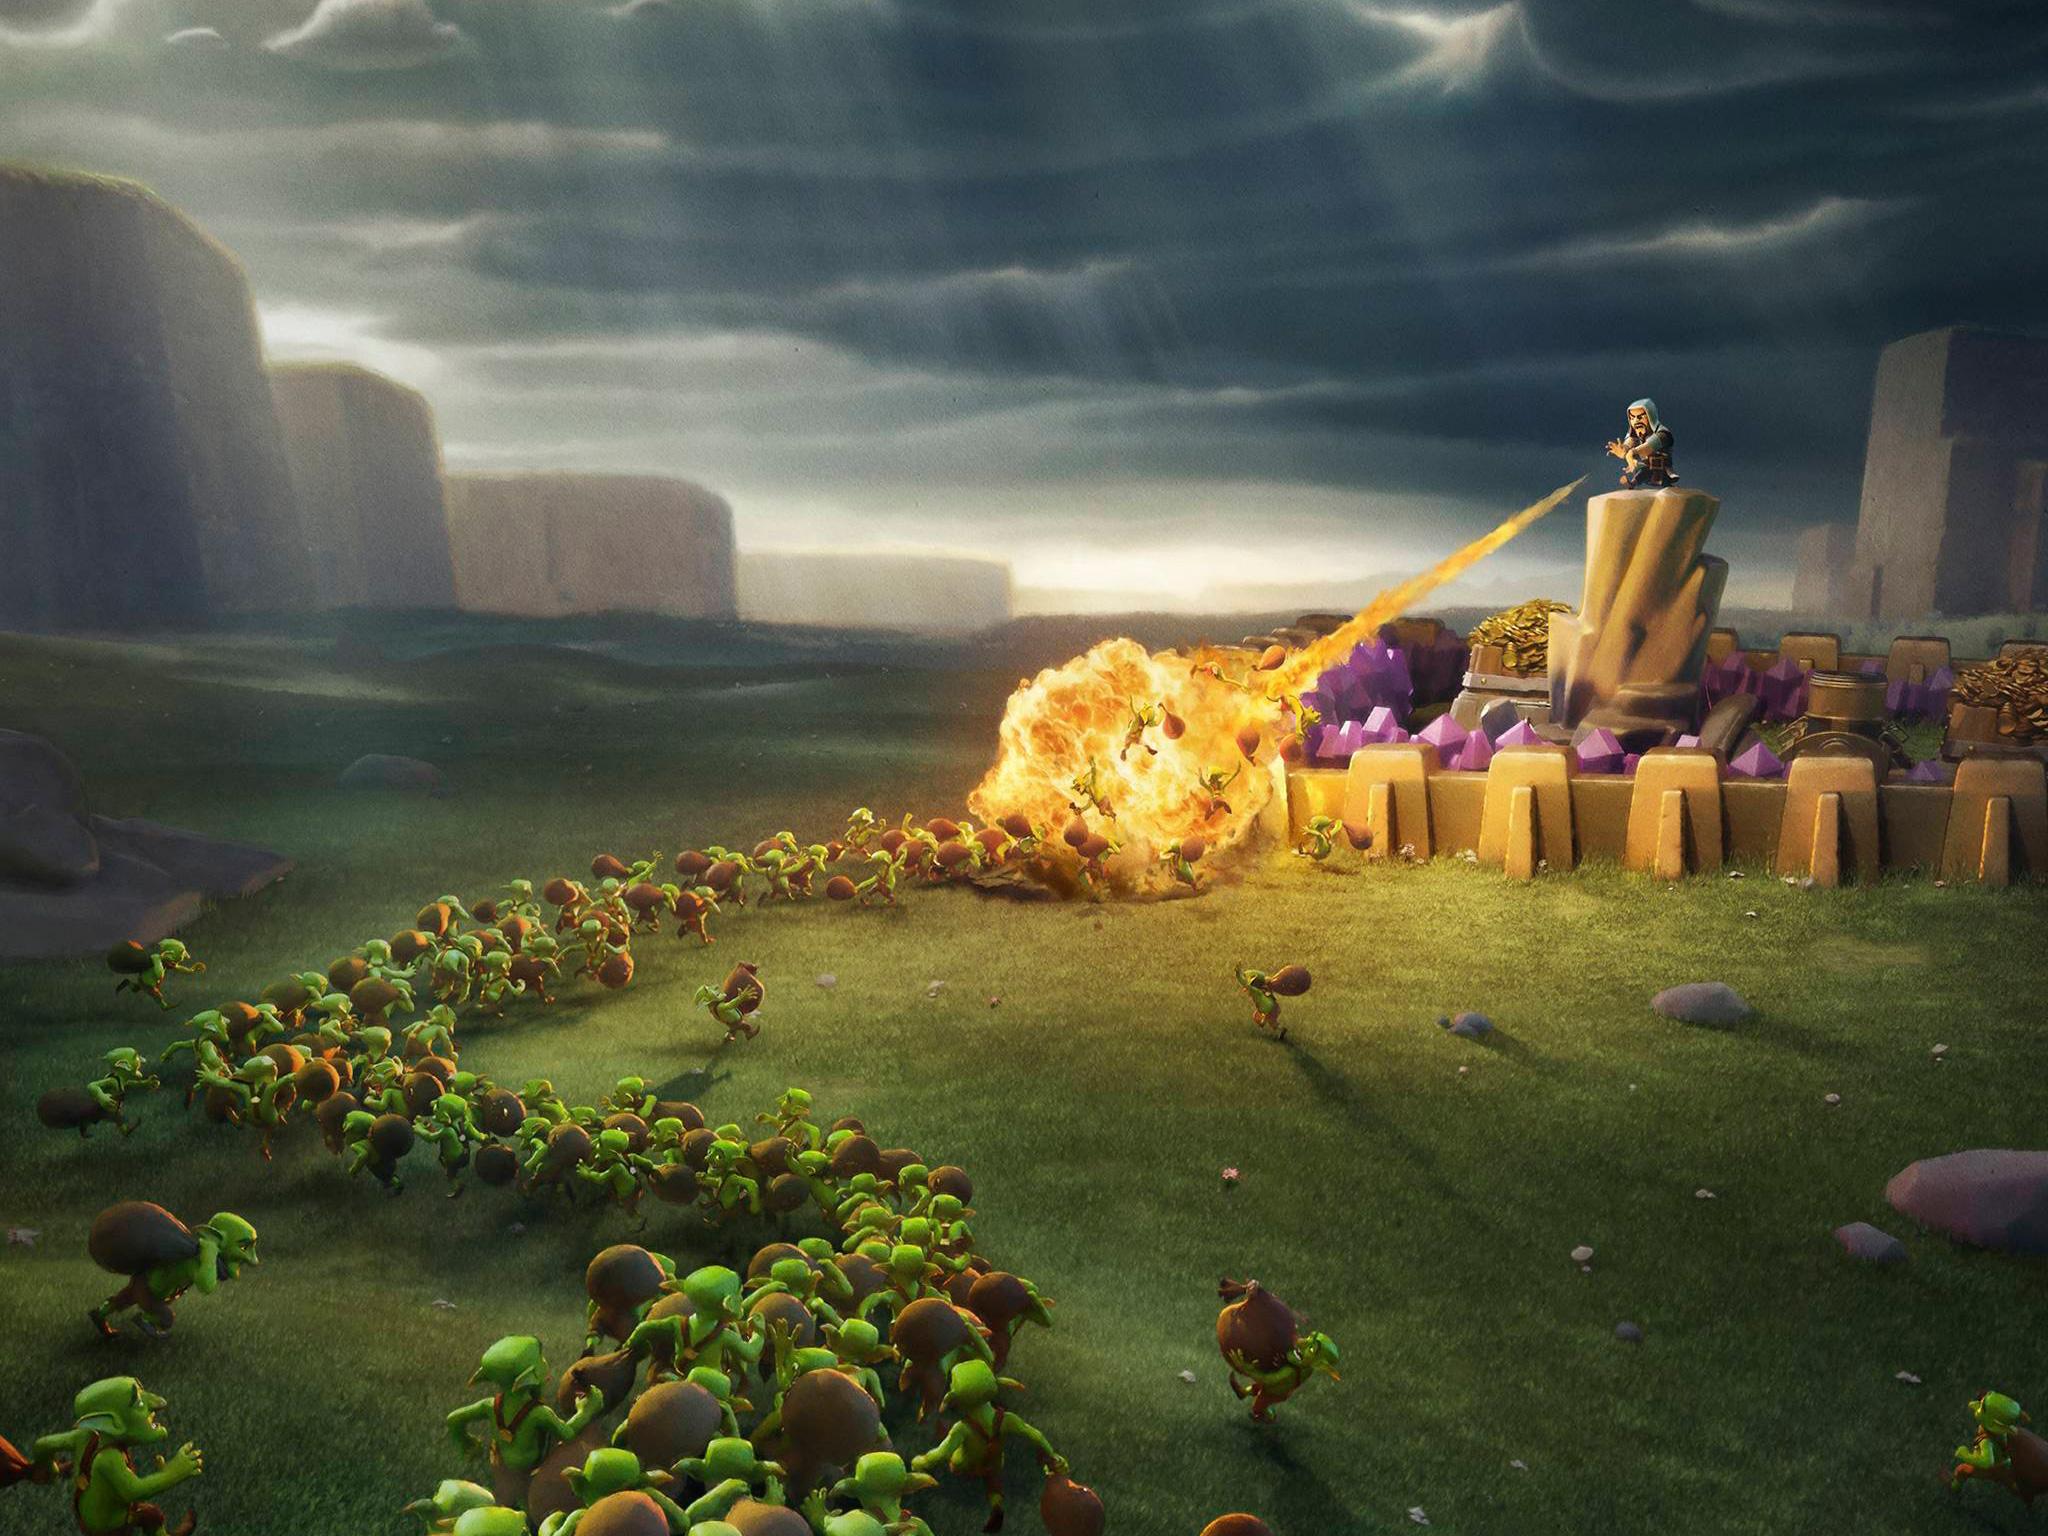 Barbarian Clash Of Clans Hd Hd Games 4k Wallpapers: Clash Of Clans Wiz And Goblins, HD Games, 4k Wallpapers